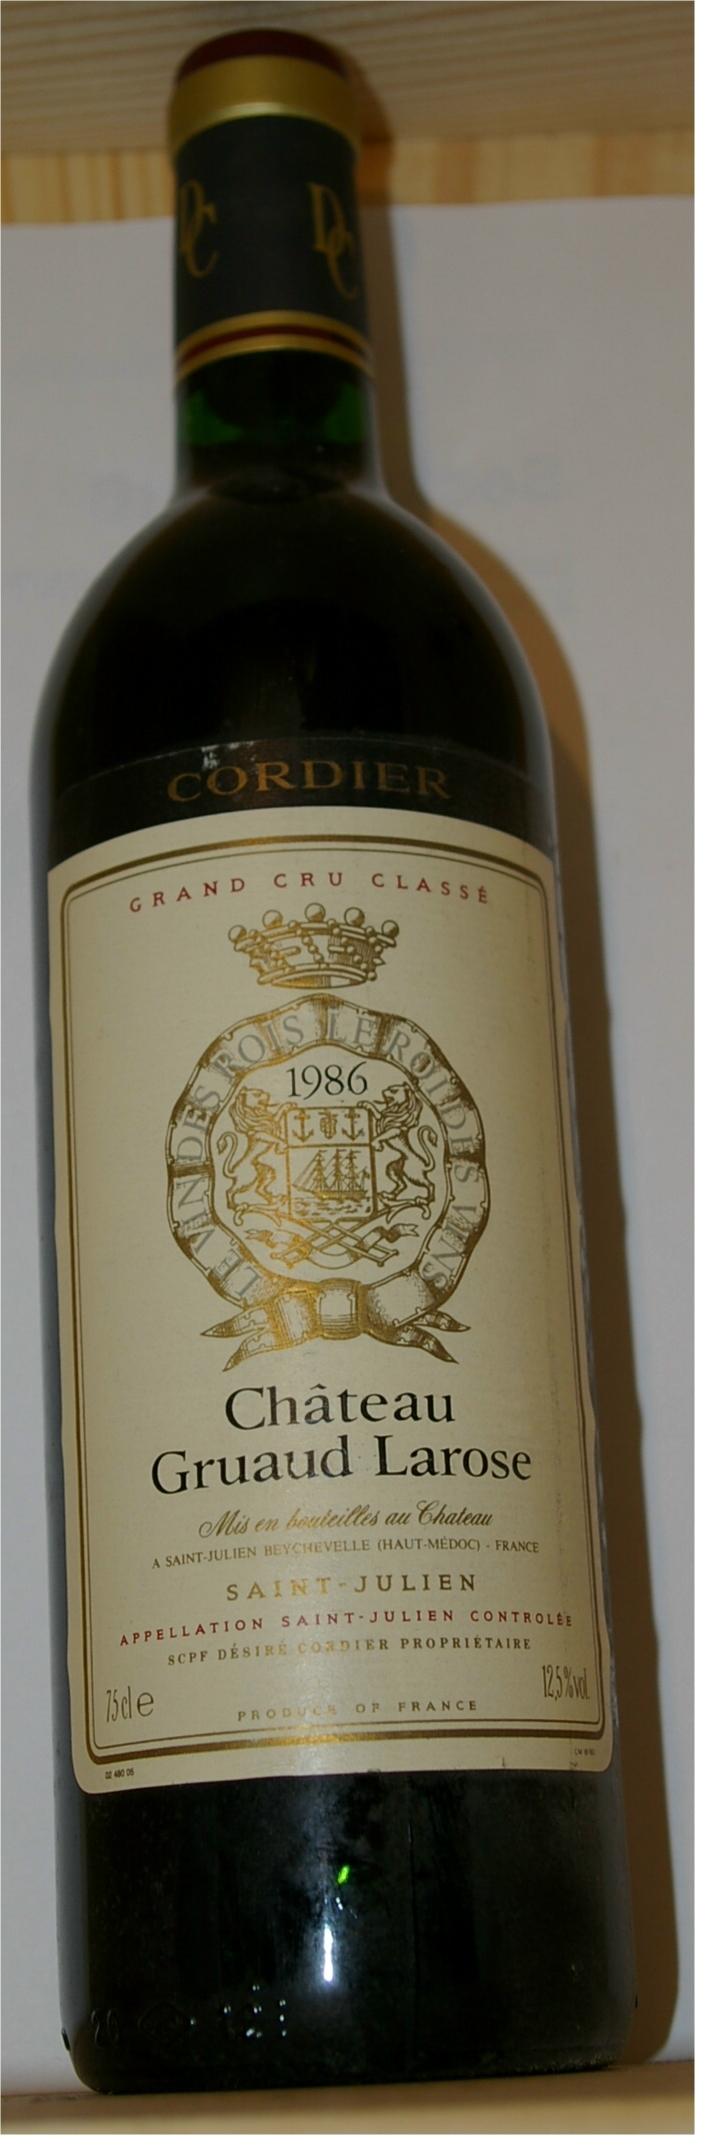 Chateau gruaud larose 2018